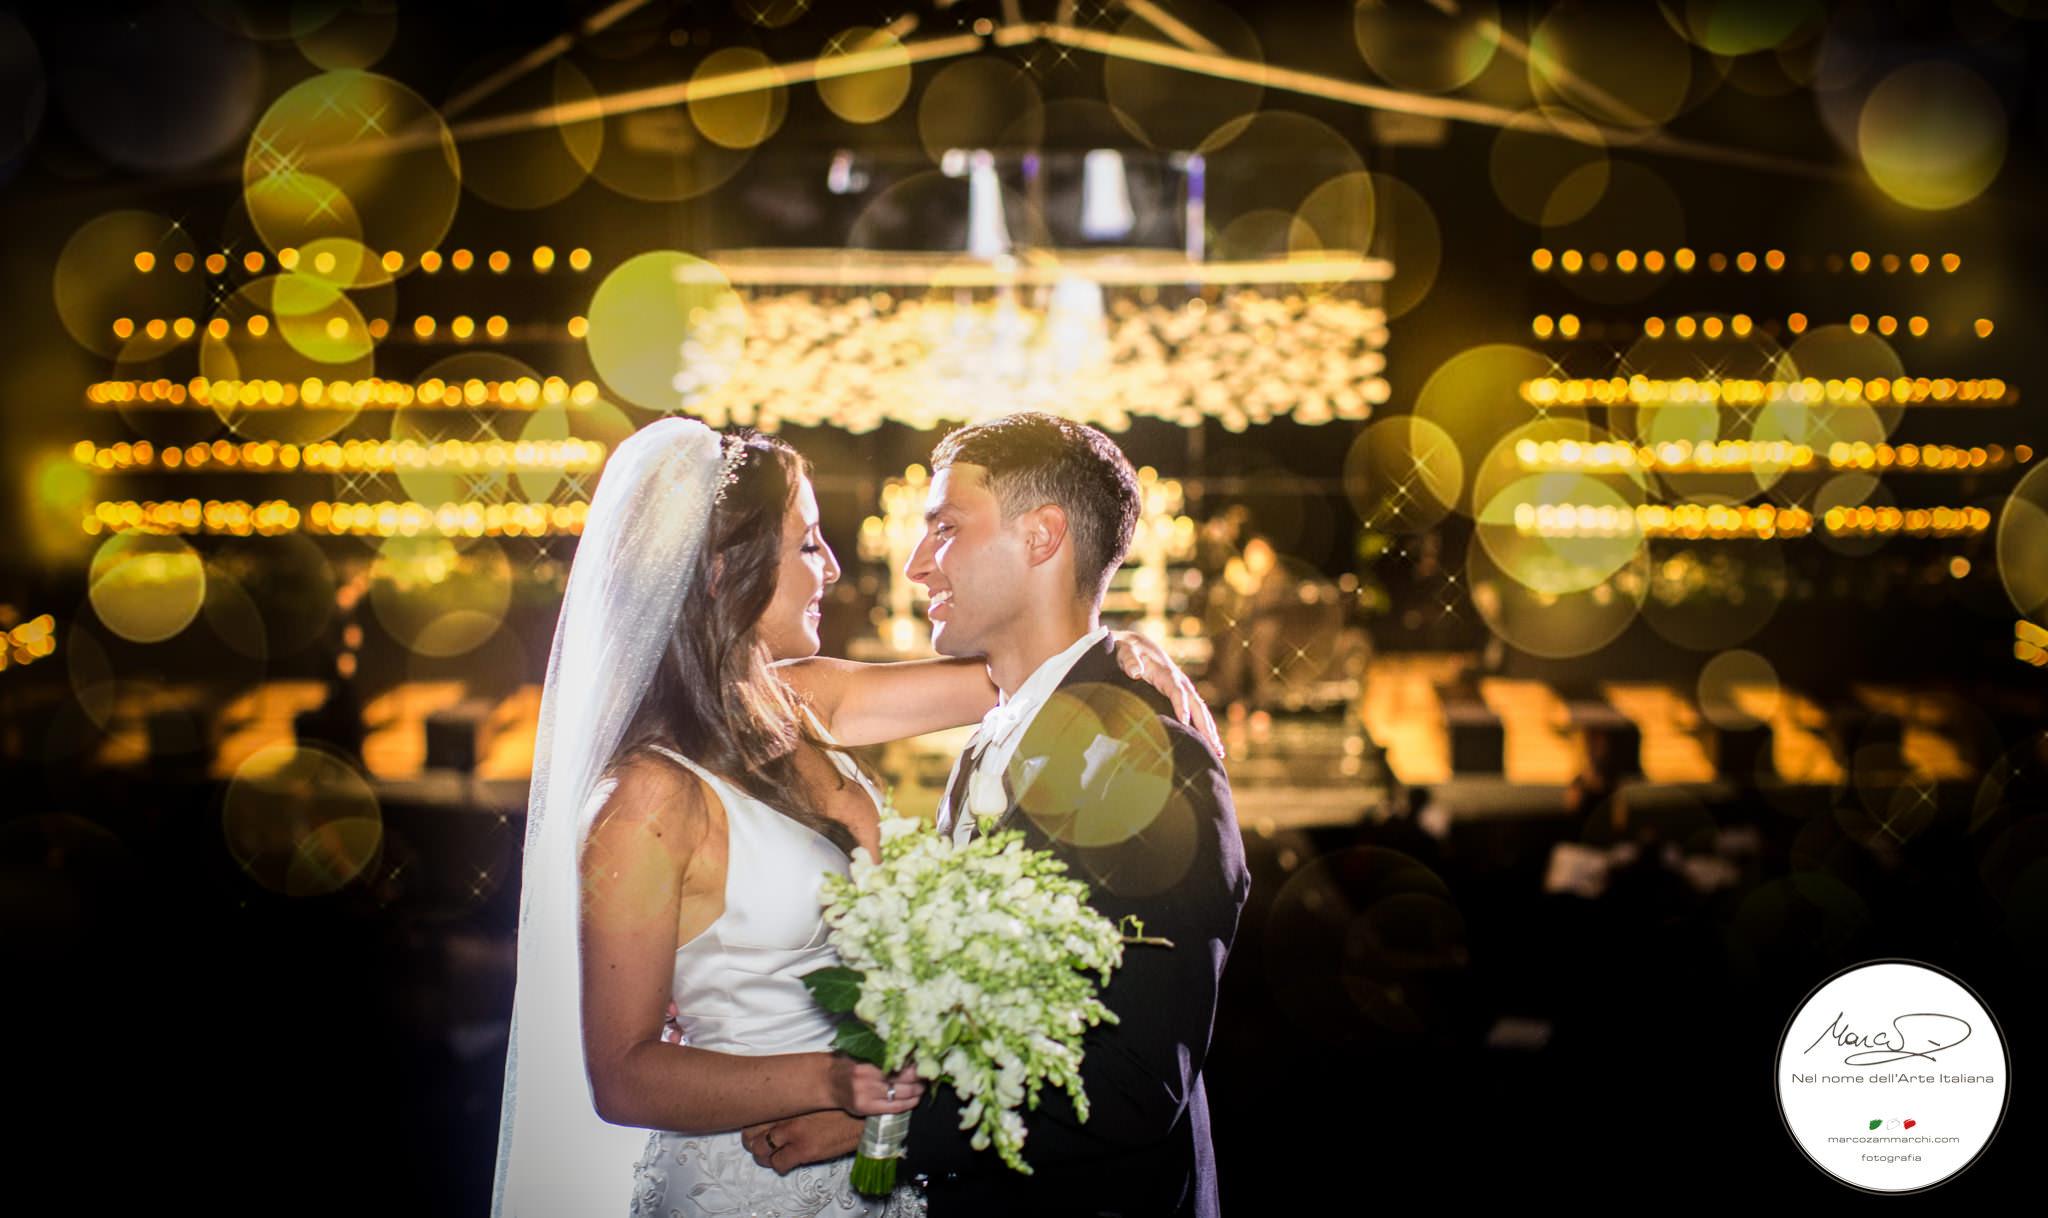 Primeiro casamento da historia na Opera de Arame!